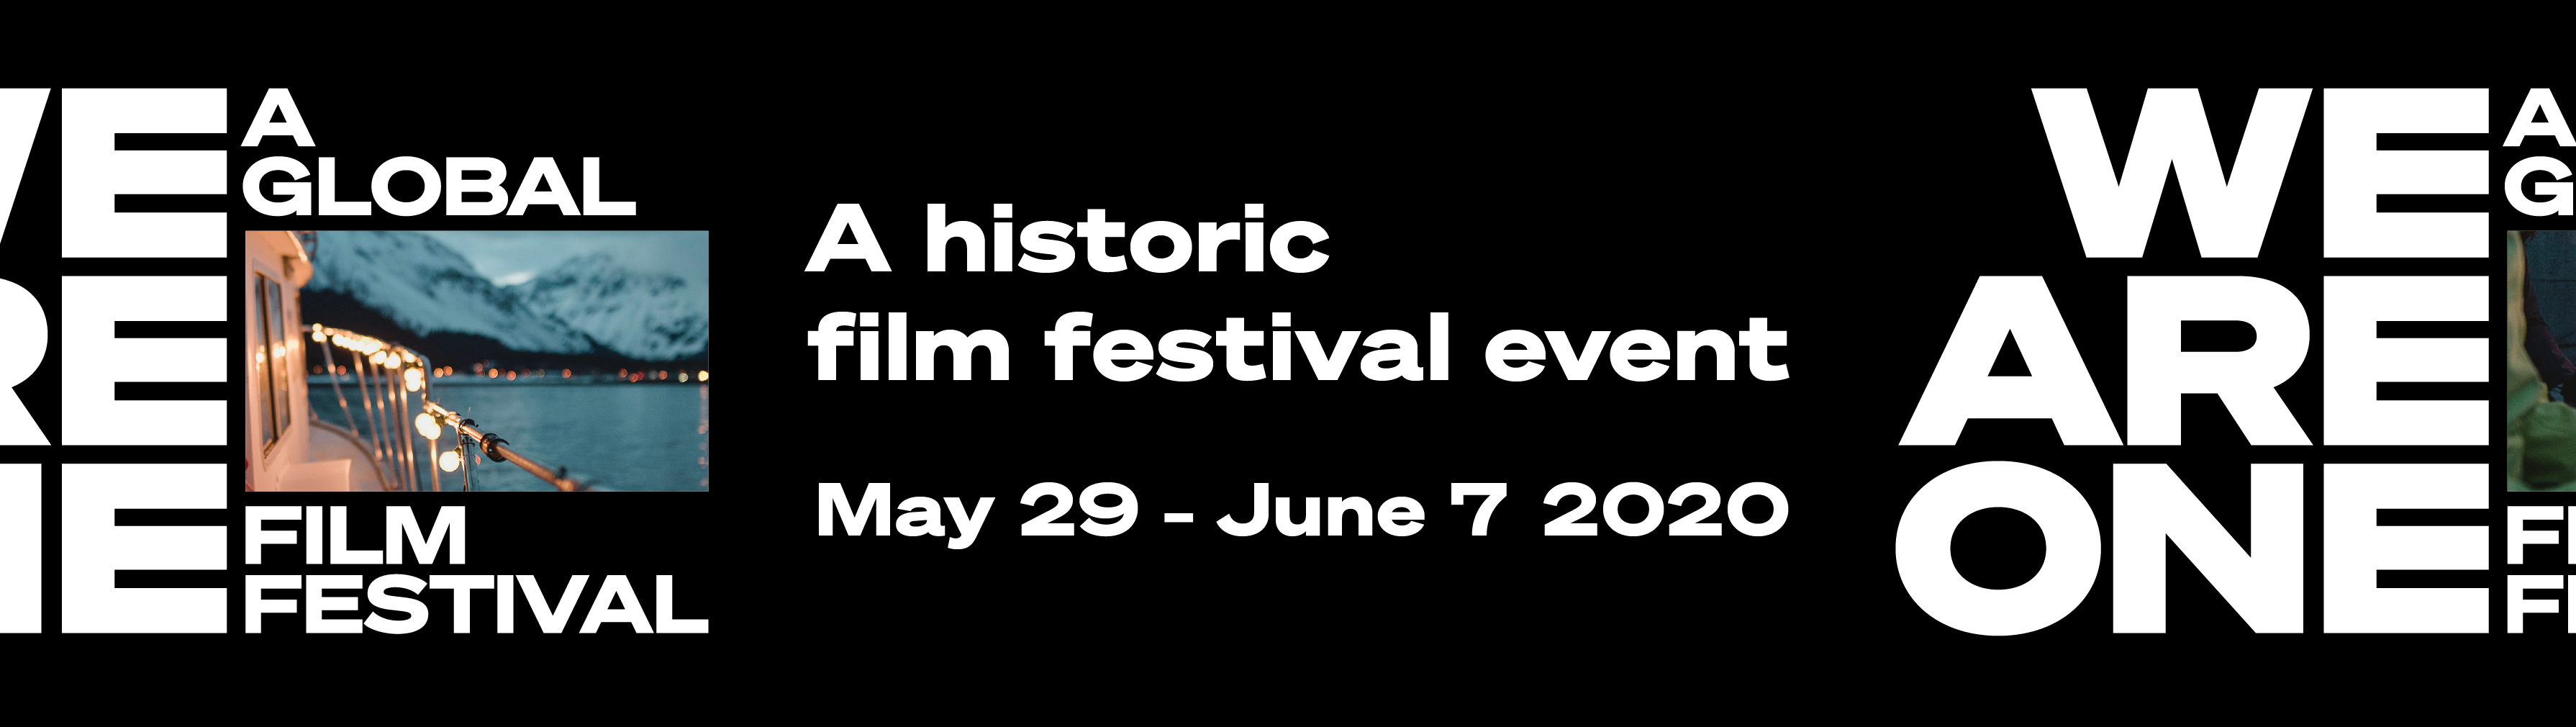 We Are One Festival White logo